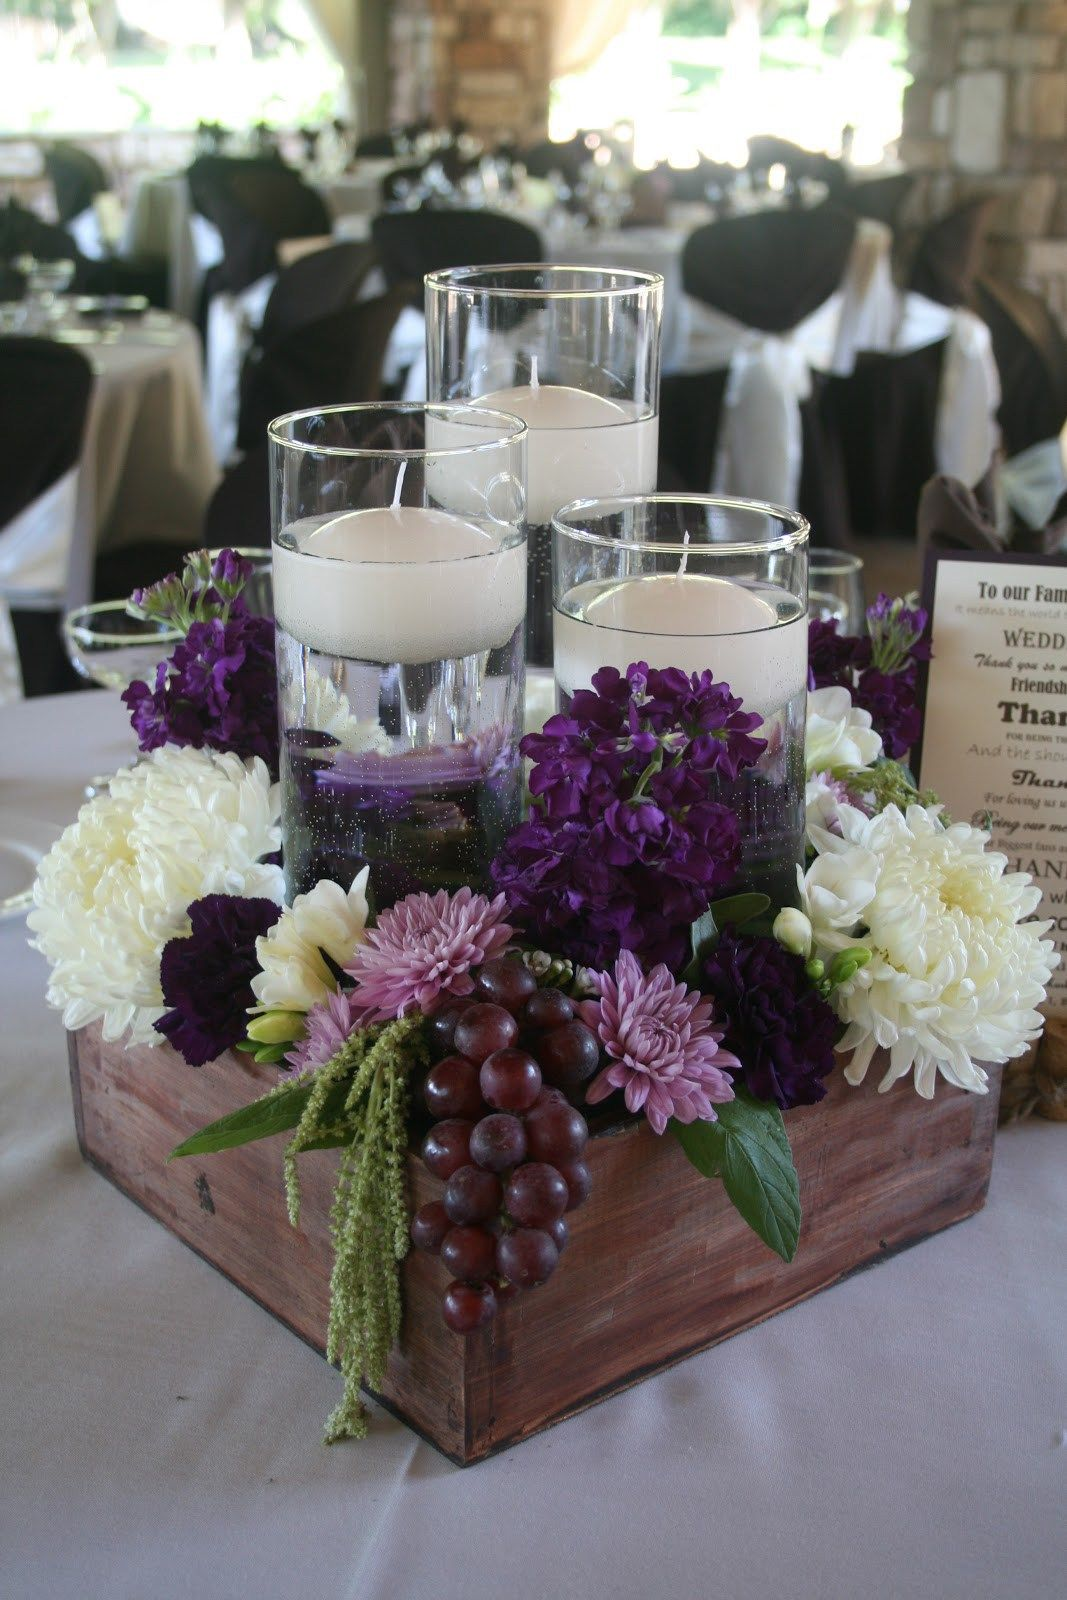 Centros de mesa para primera comuni n communion - Centros de mesa comunion ...